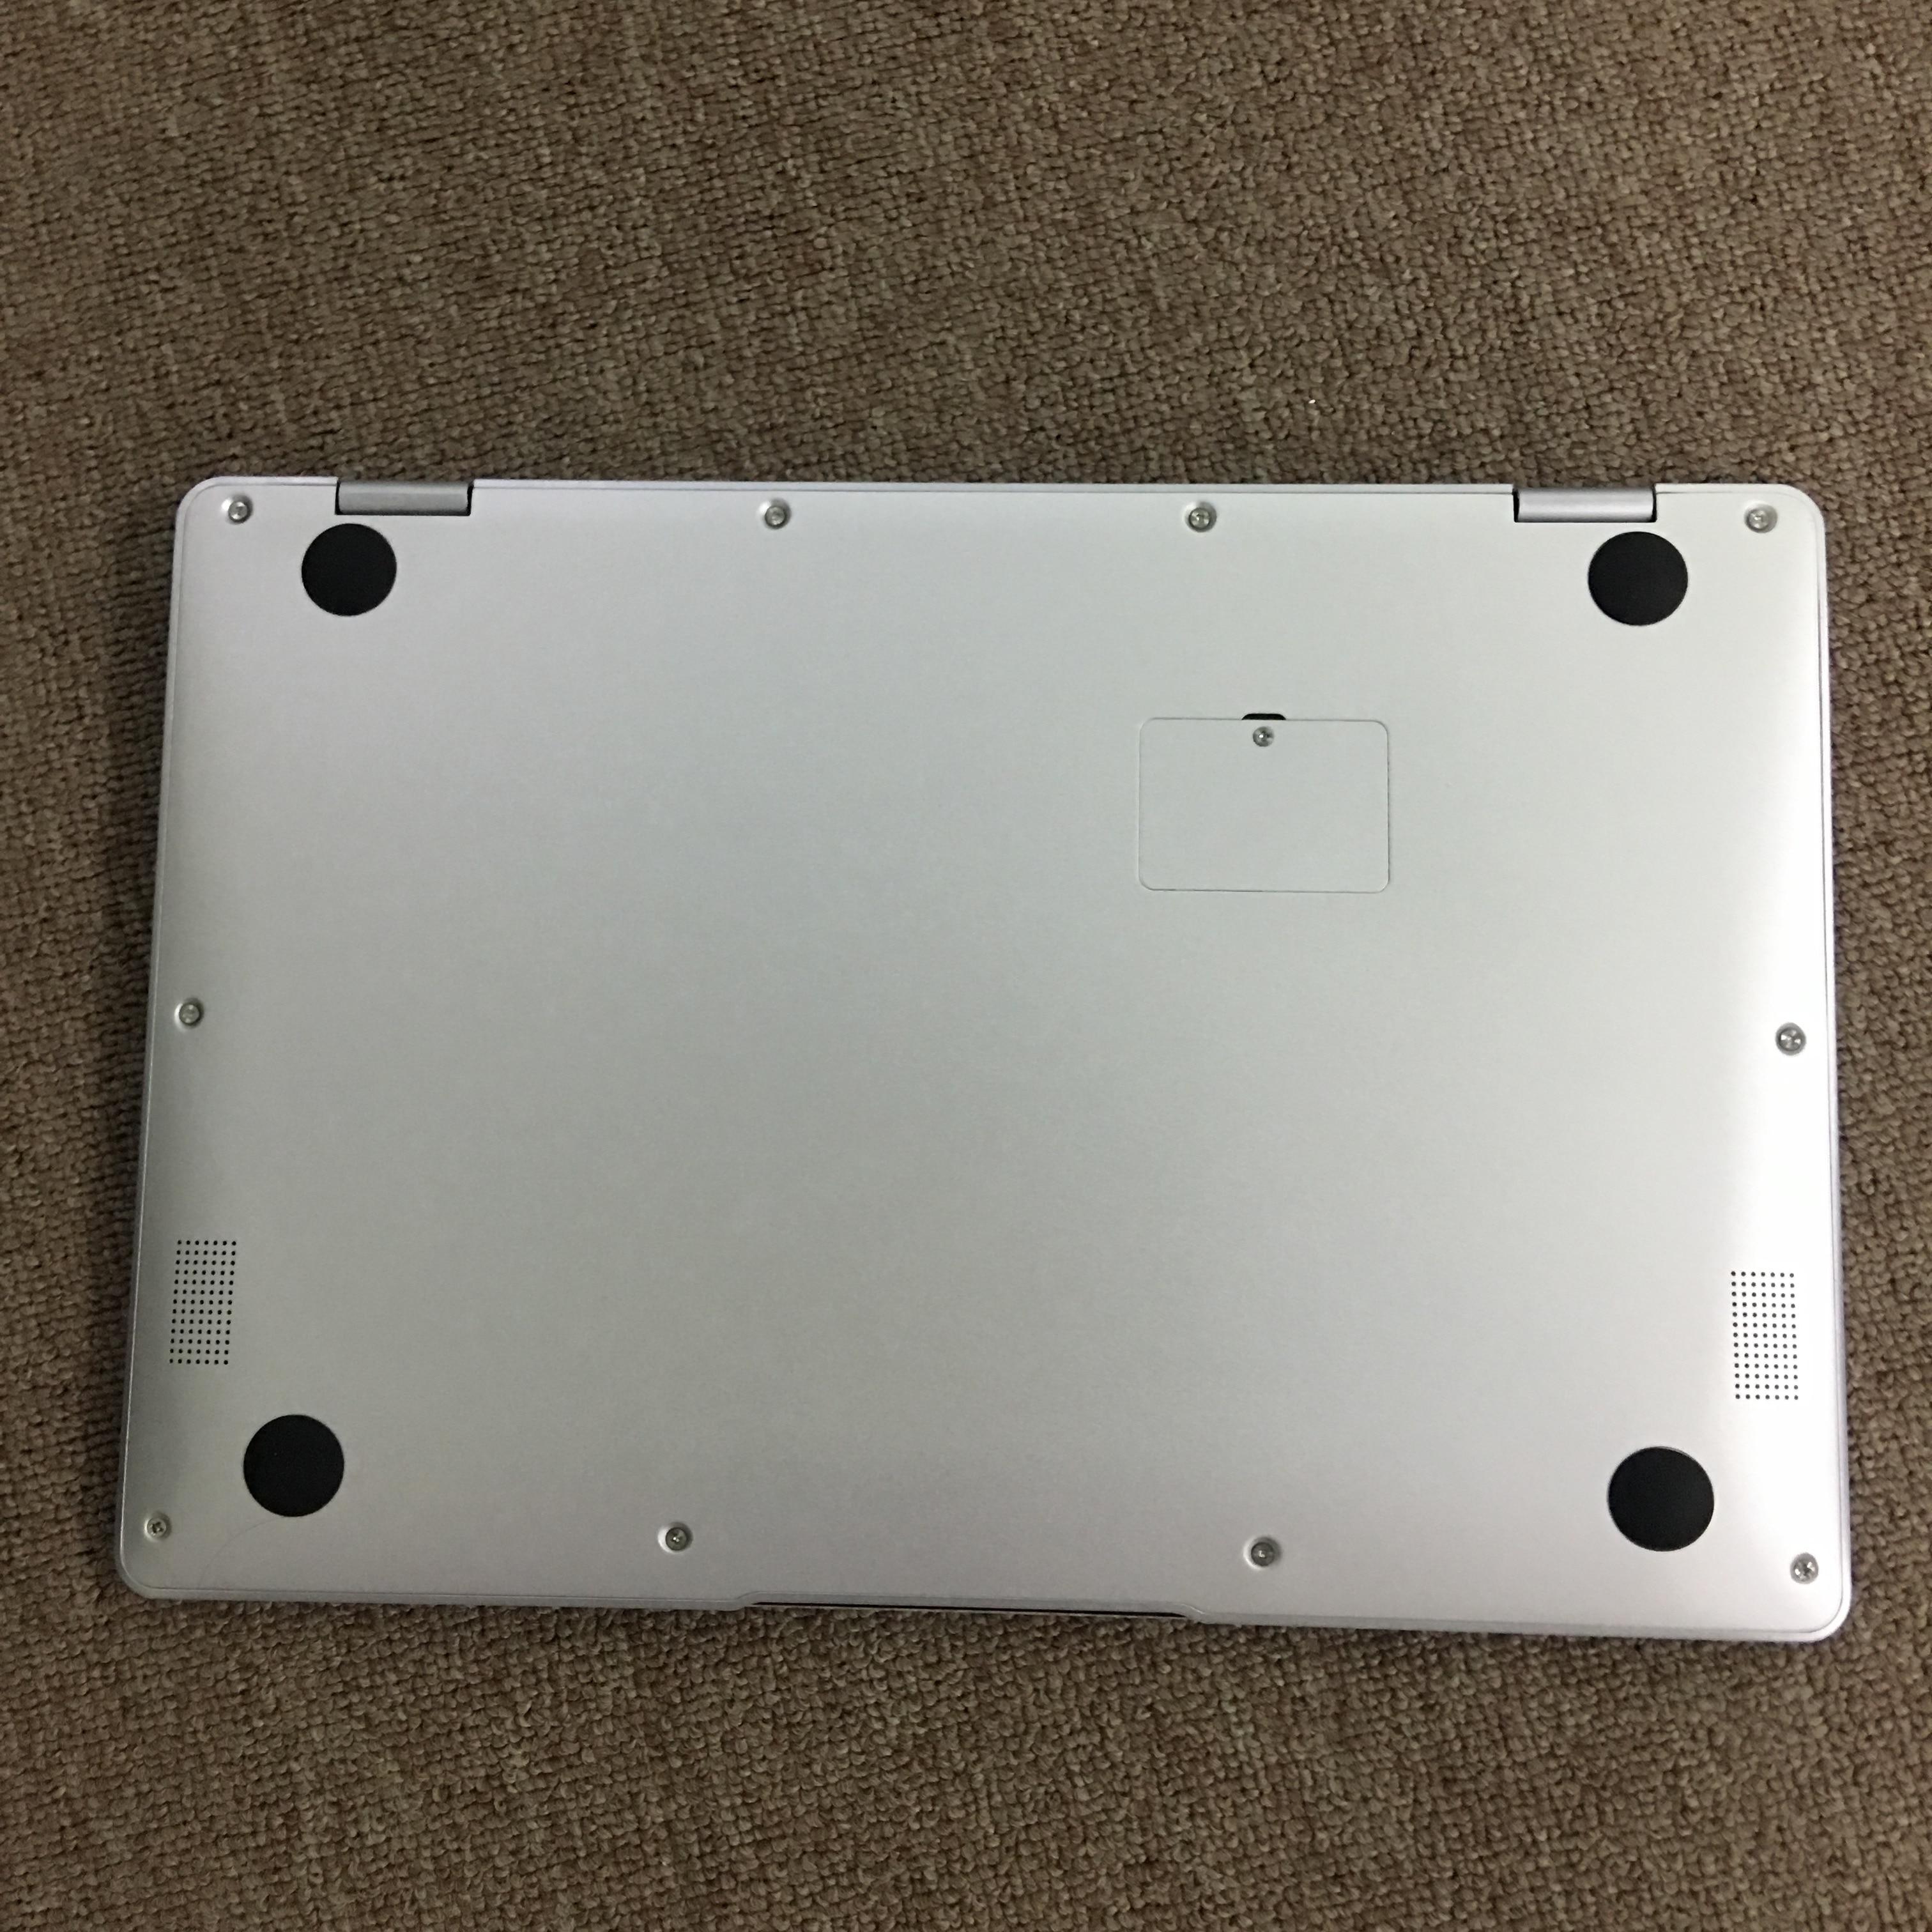 Lapbook SE 13.3 Inch Win 10 Intel Gemini-Lake N4100 Laptop With Backlit Keyboard RAM 4GB ROM 64GB 160GB Ultra Notebook